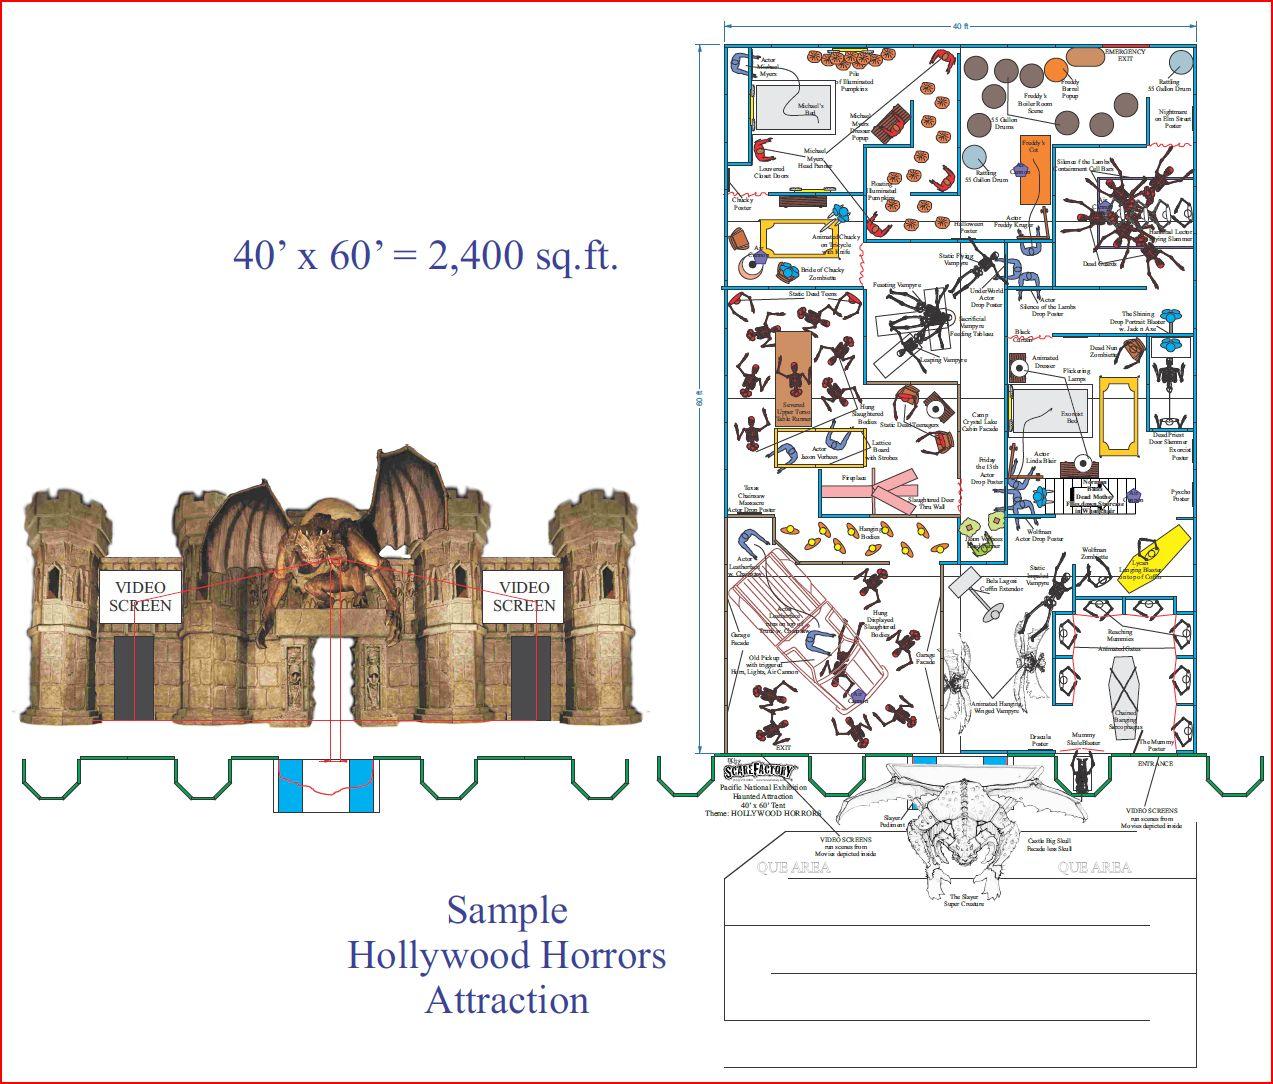 HollywoodHorrors-2